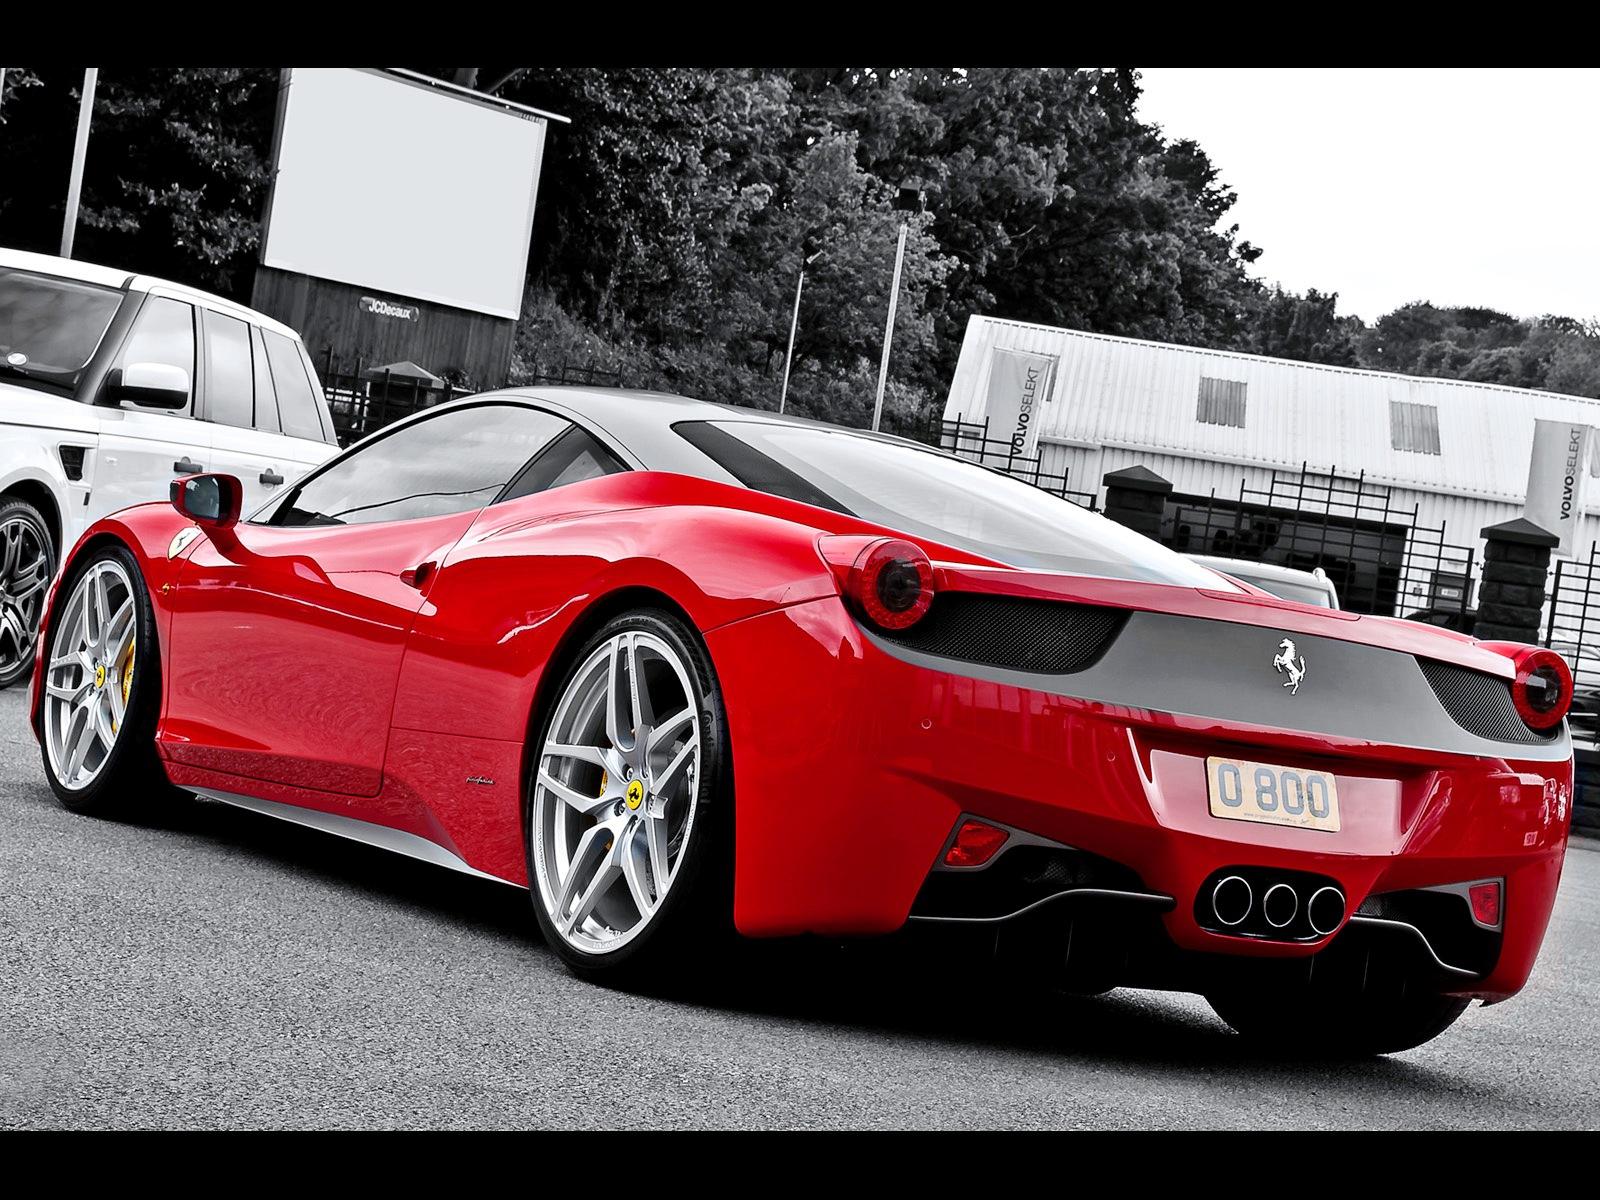 2012 ferrari 458 italia by a kahn design news hot car. Cars Review. Best American Auto & Cars Review